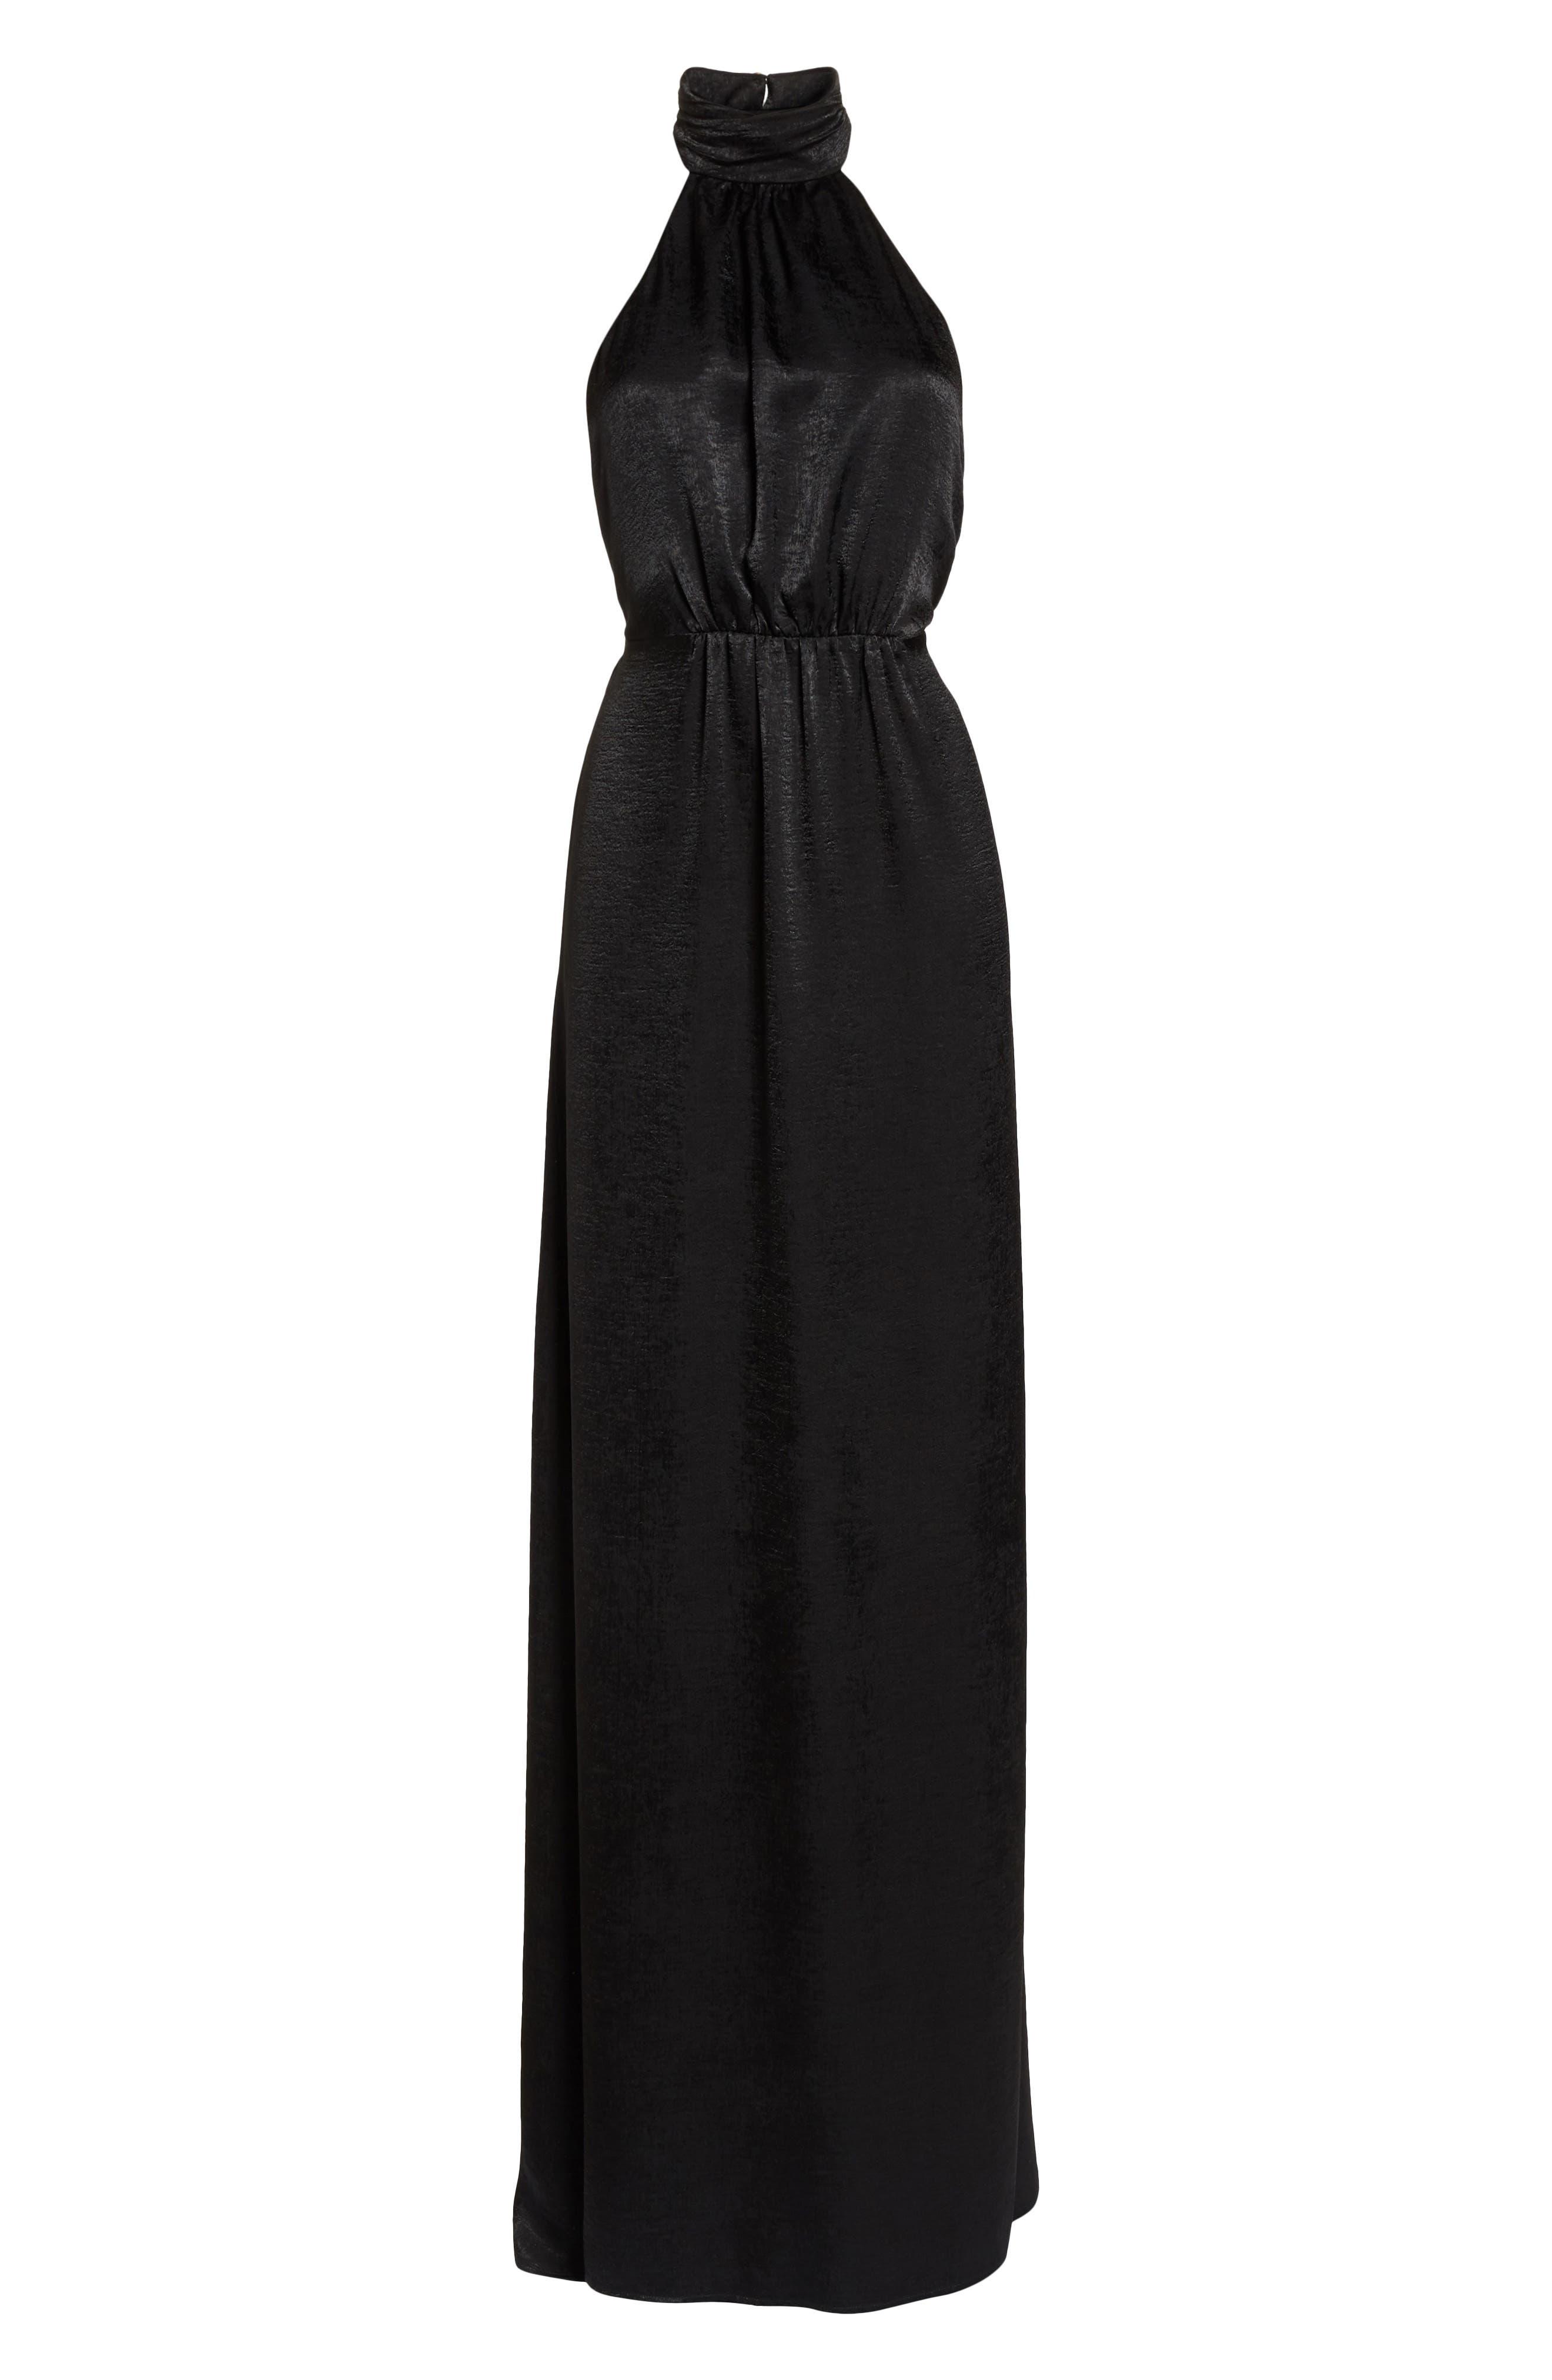 Collette Halter Gown,                             Alternate thumbnail 7, color,                             Black Sheen